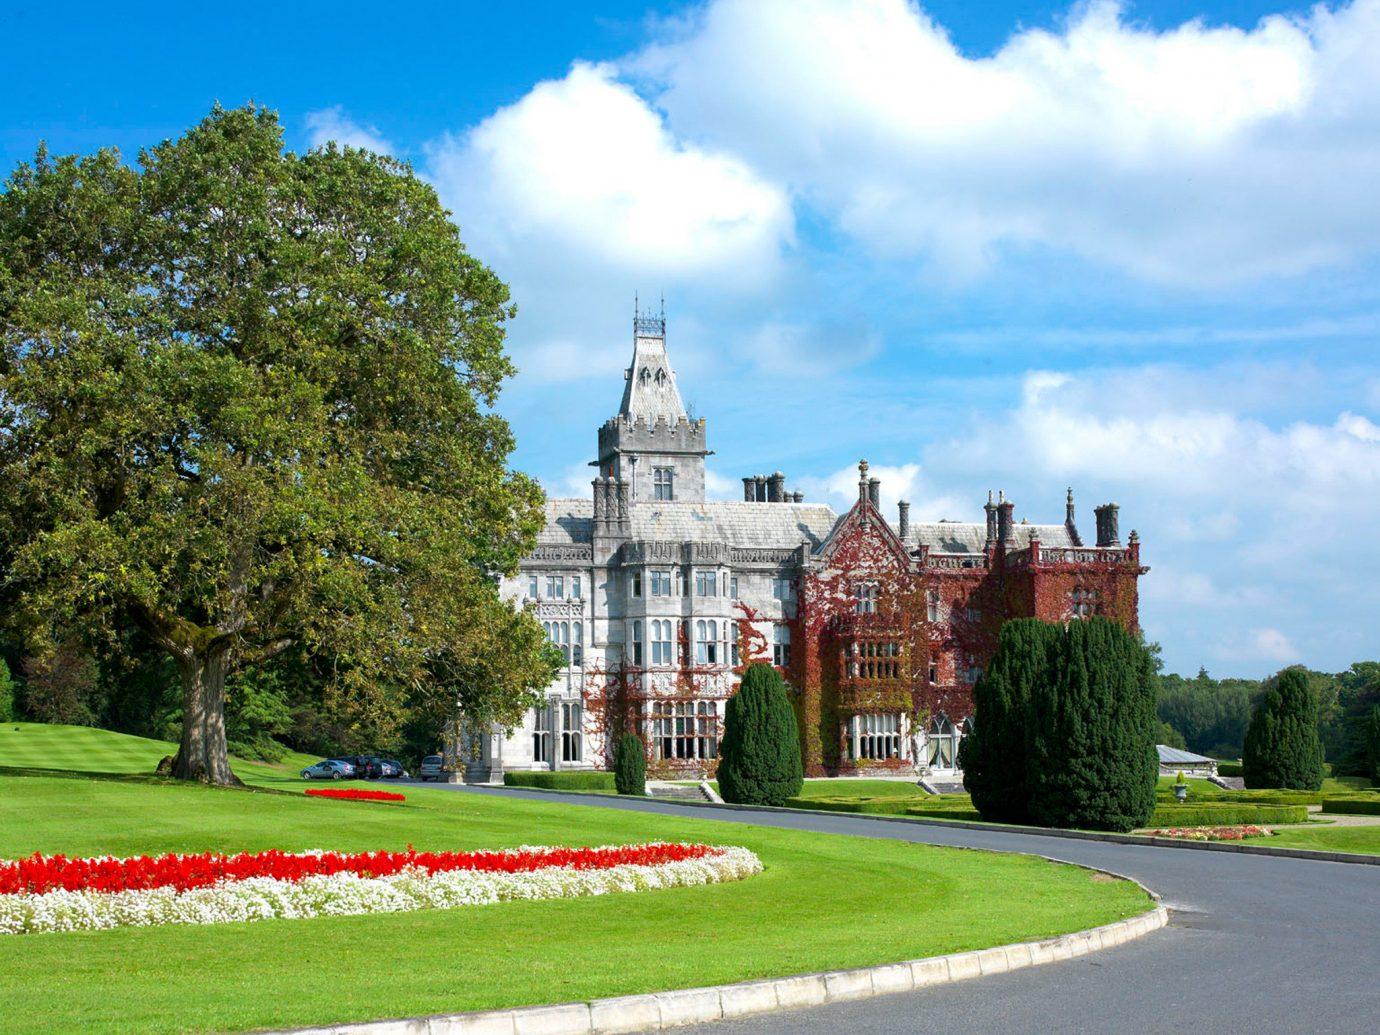 Grounds at Adare Manor in Ireland